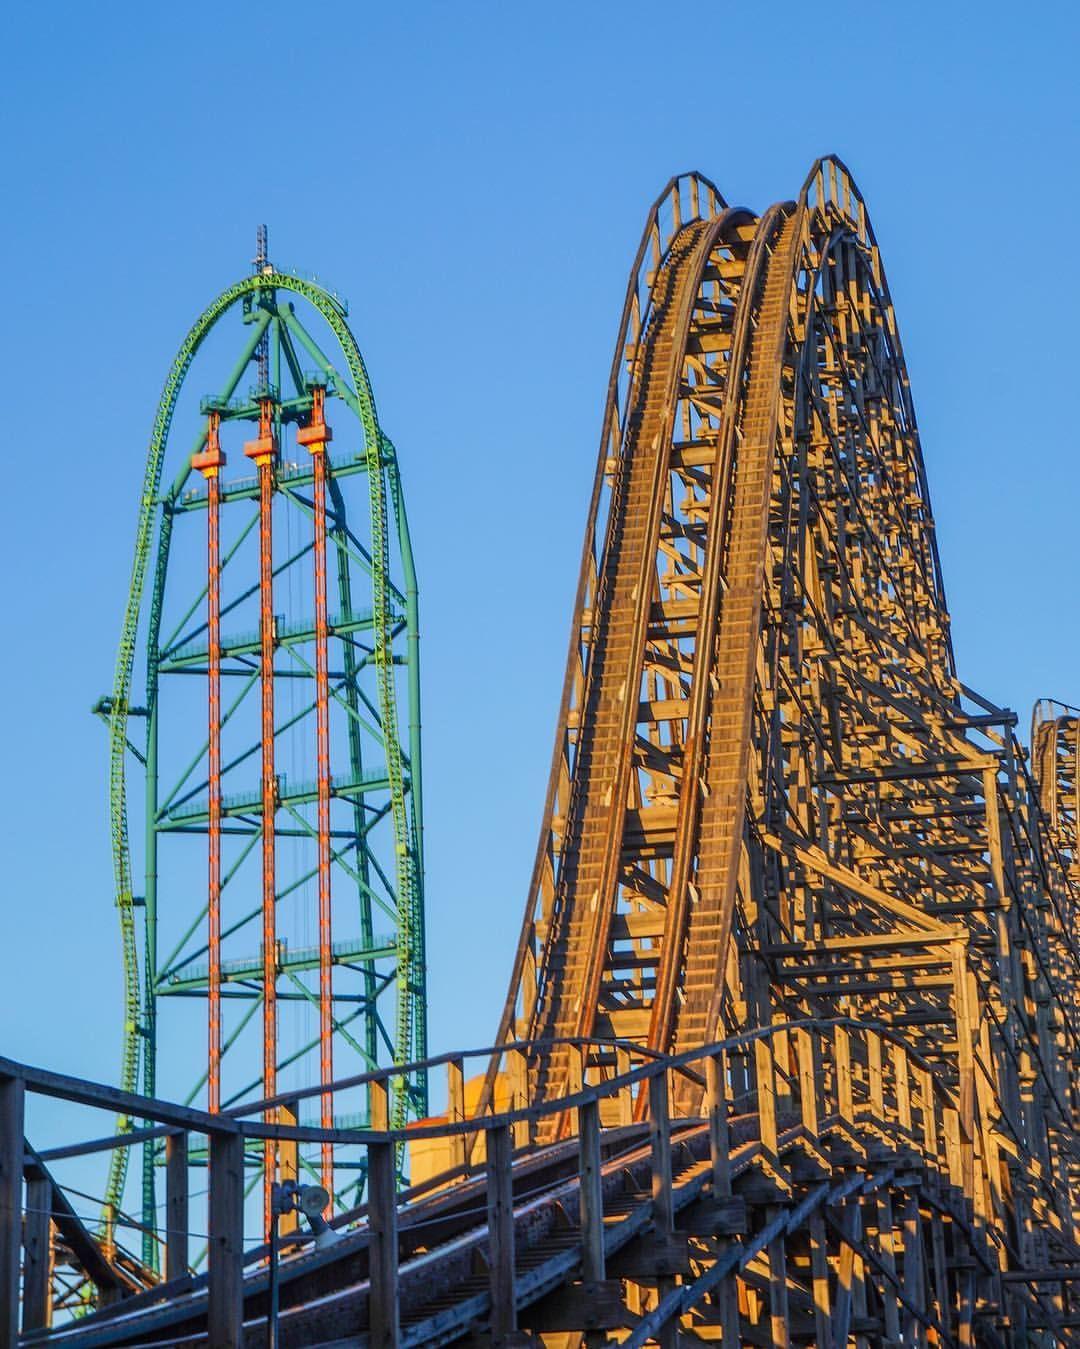 El Toro And Kingda Ka At Six Flags Great Adventure